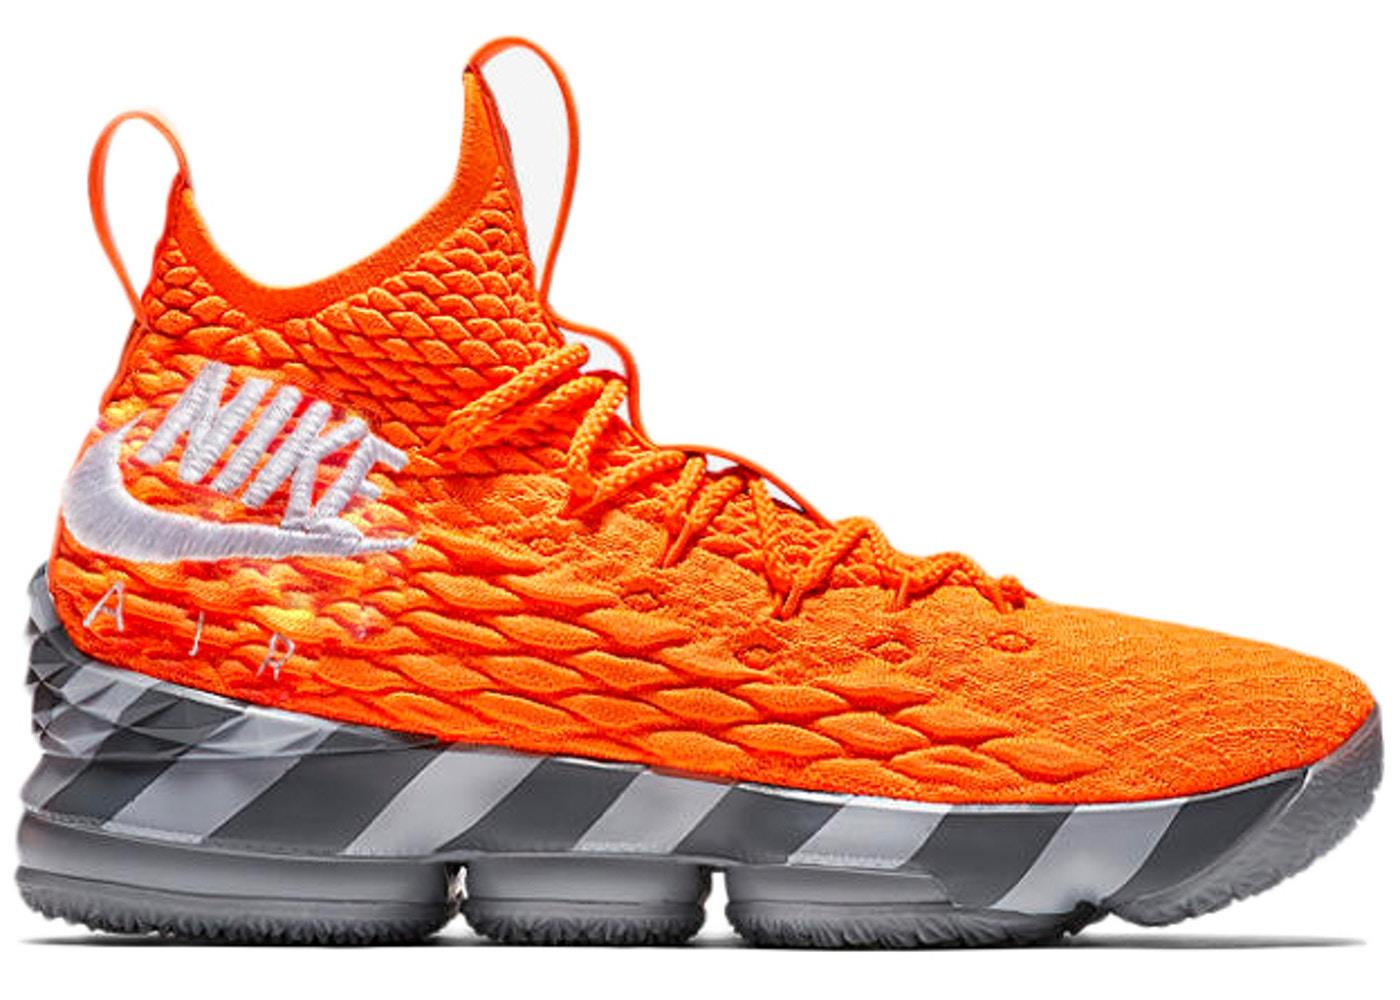 27c68925bdf Restock  Nike LeBron 15